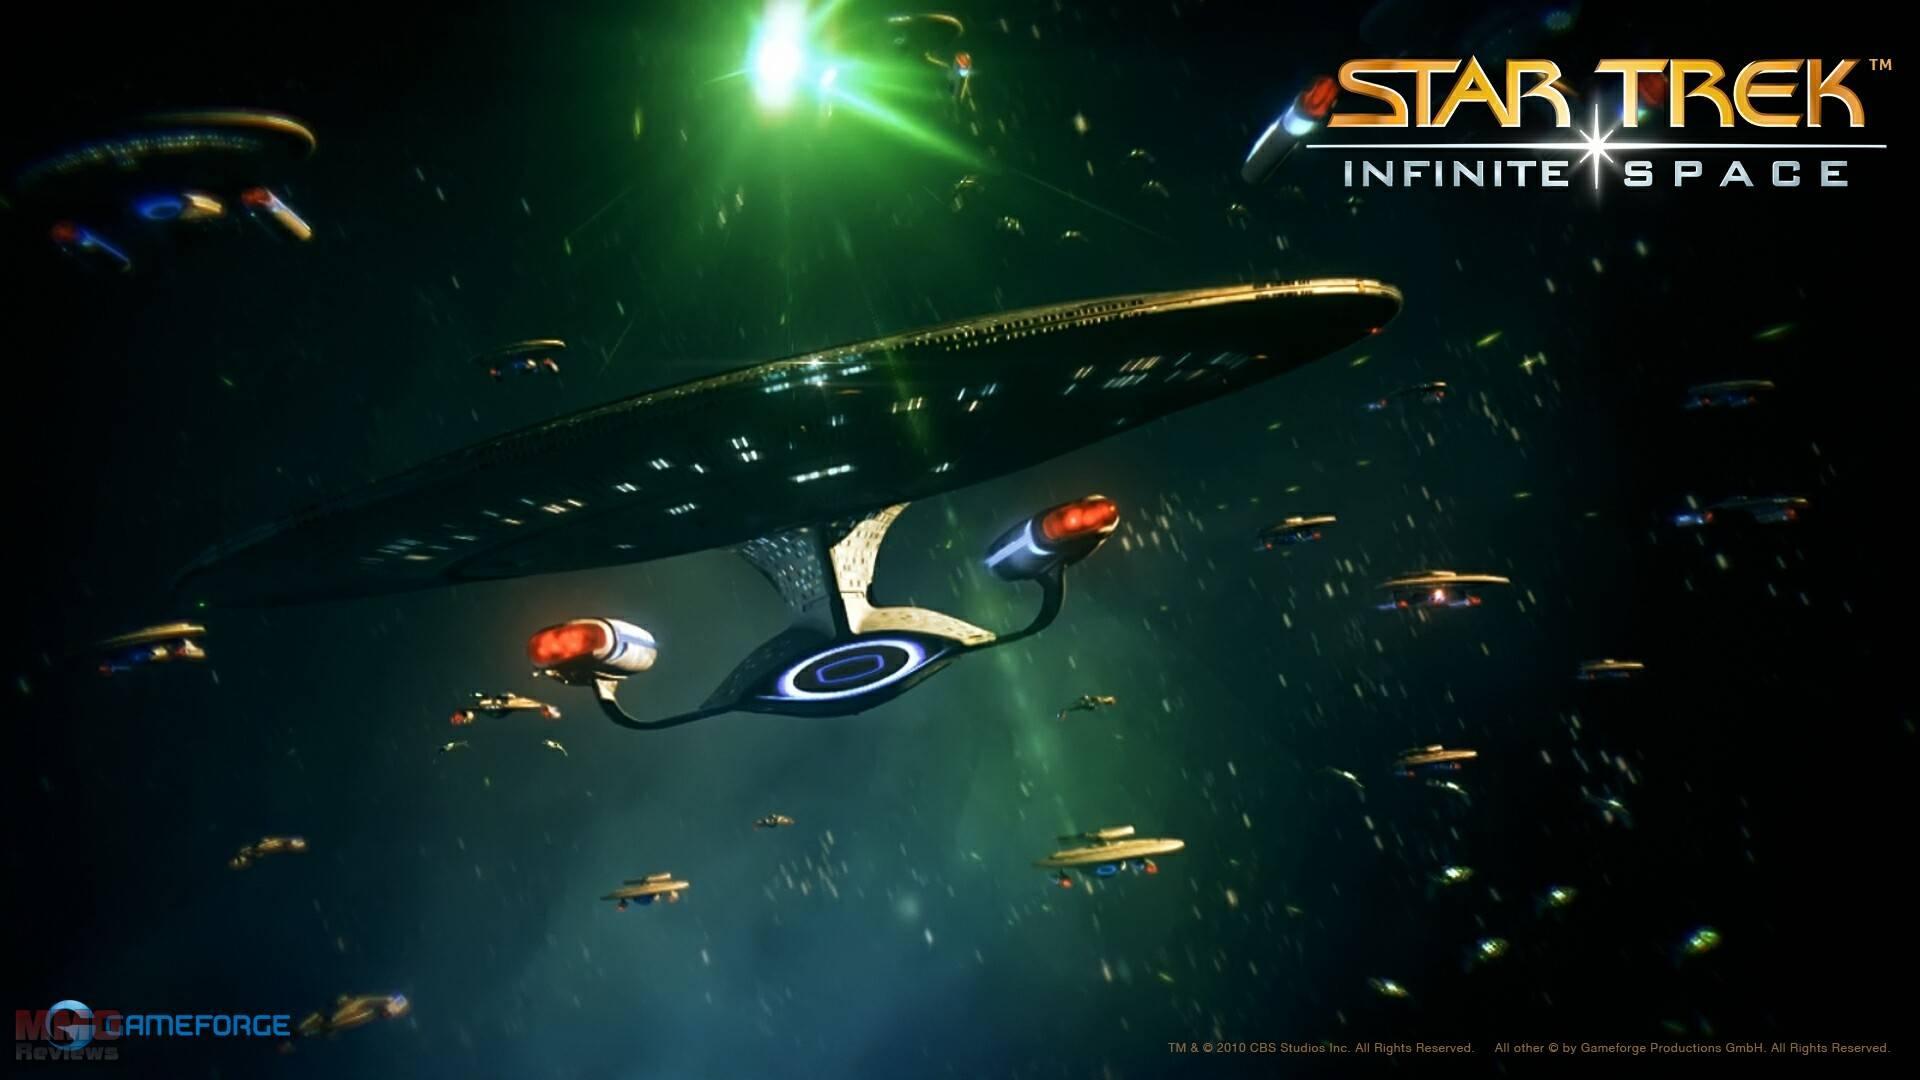 New Full HD wallpapers of Star Trek Infinite Space 1920x1080